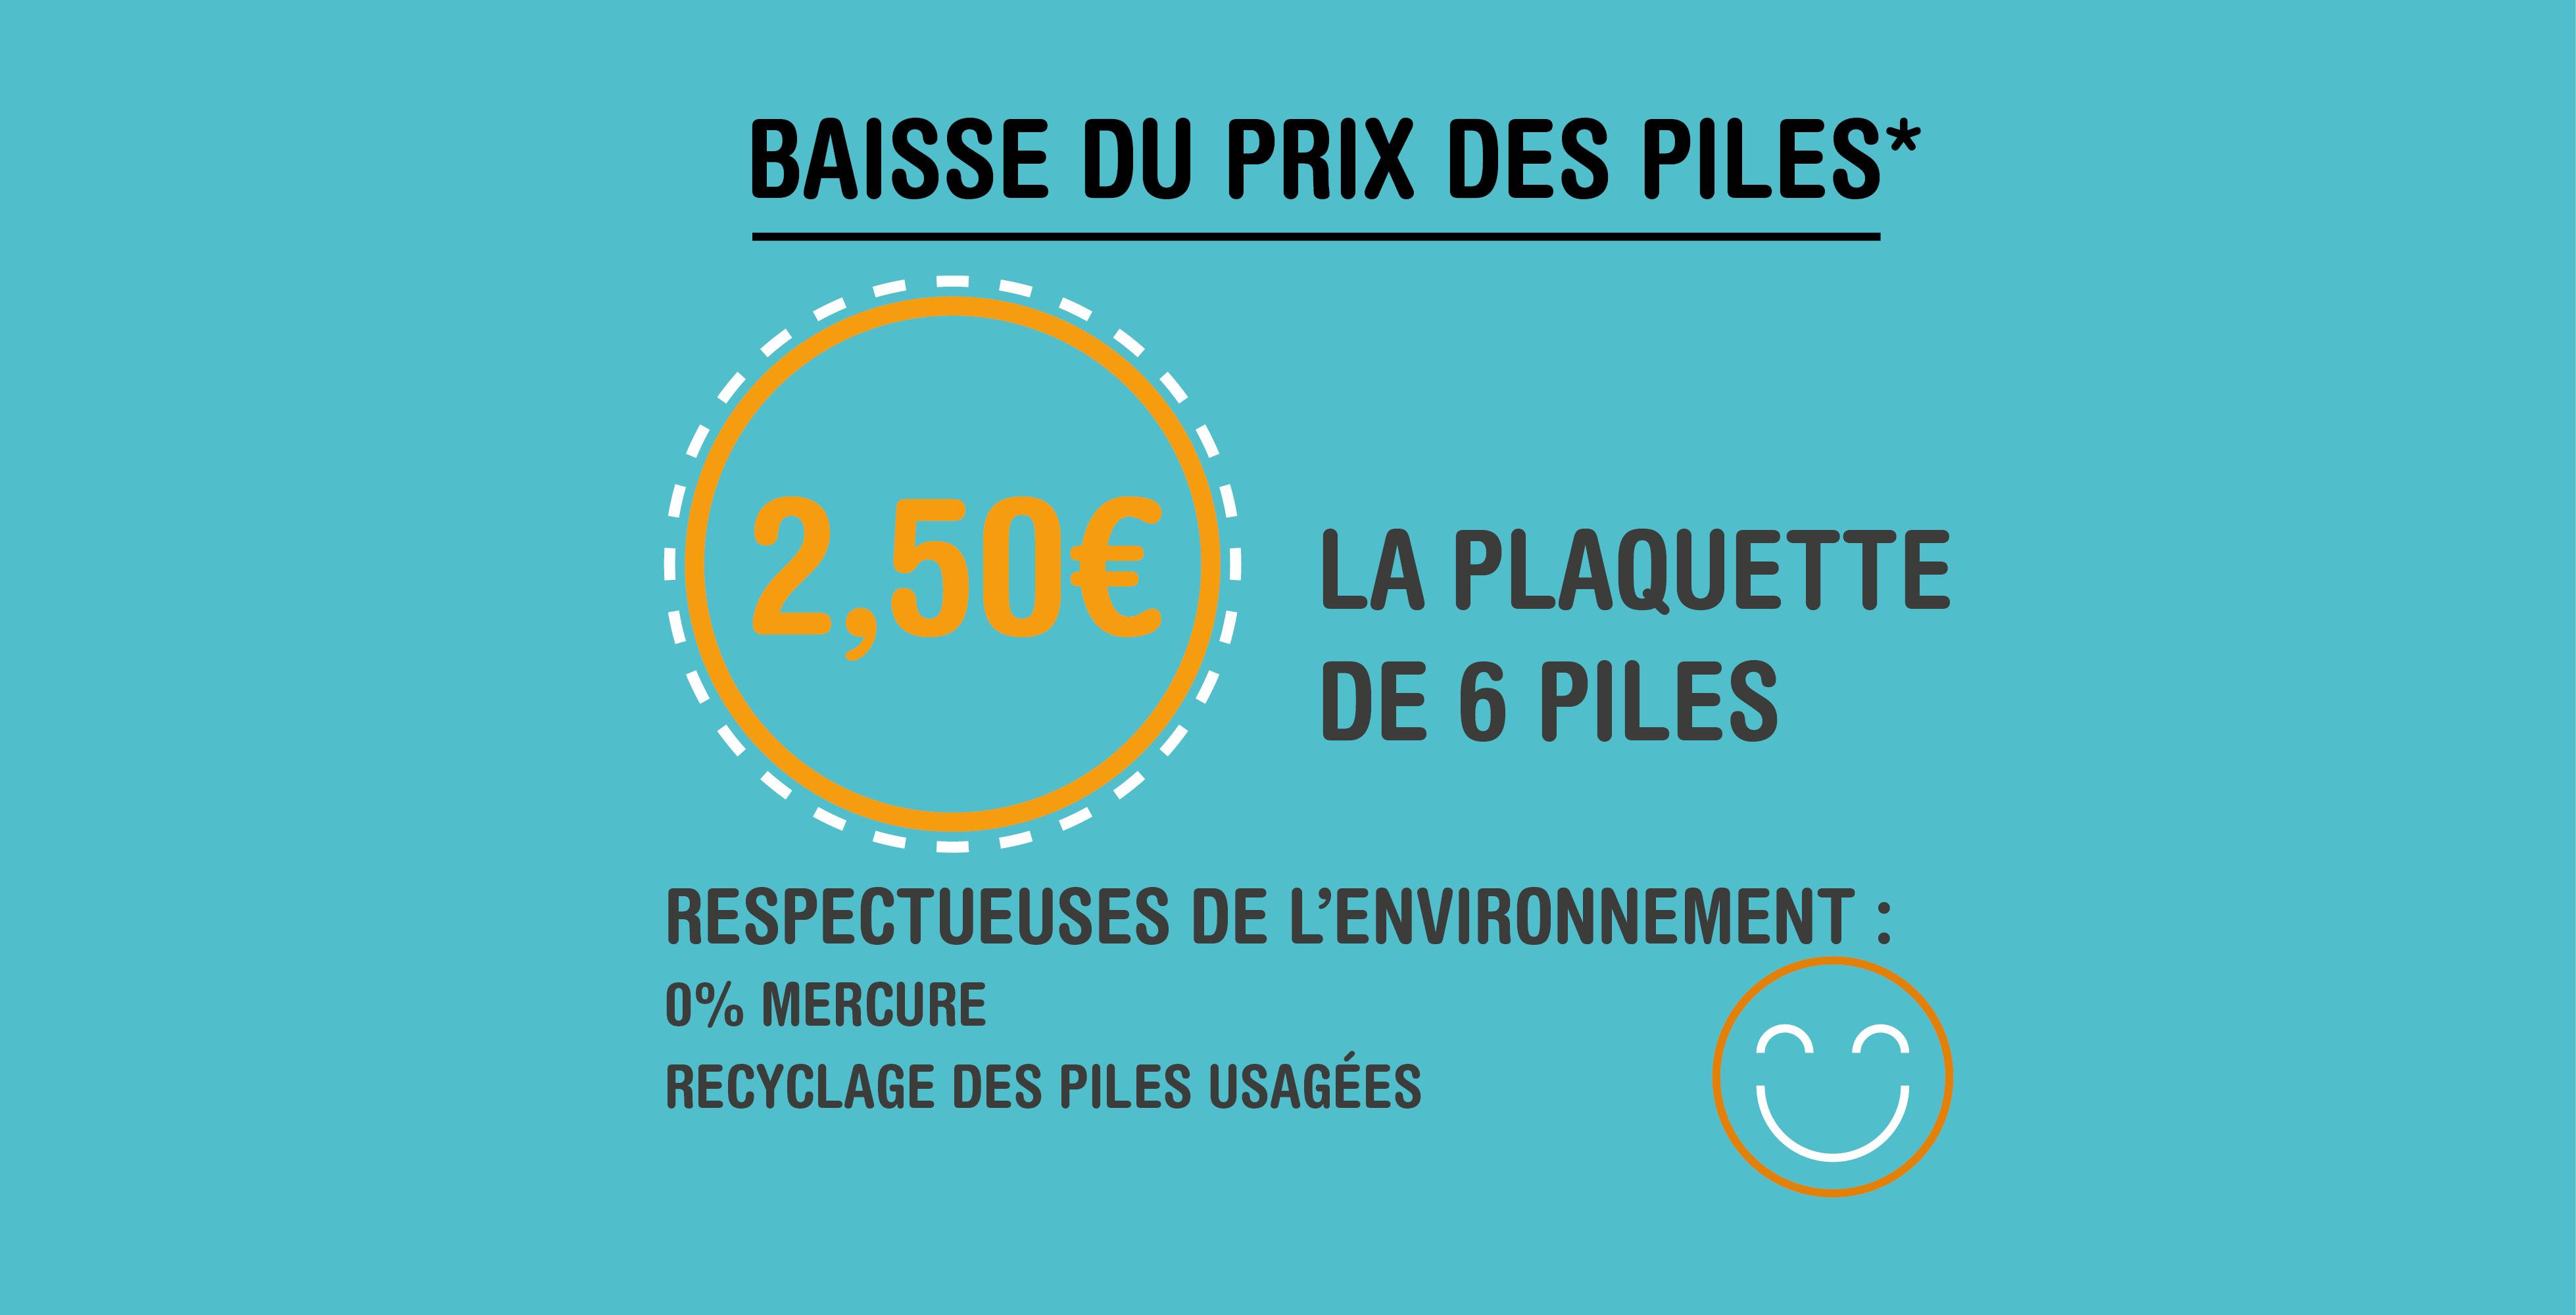 Audition - Appareillage auditif Béarn Pays Basque - Mutualité 64 ... c0654fe6d315